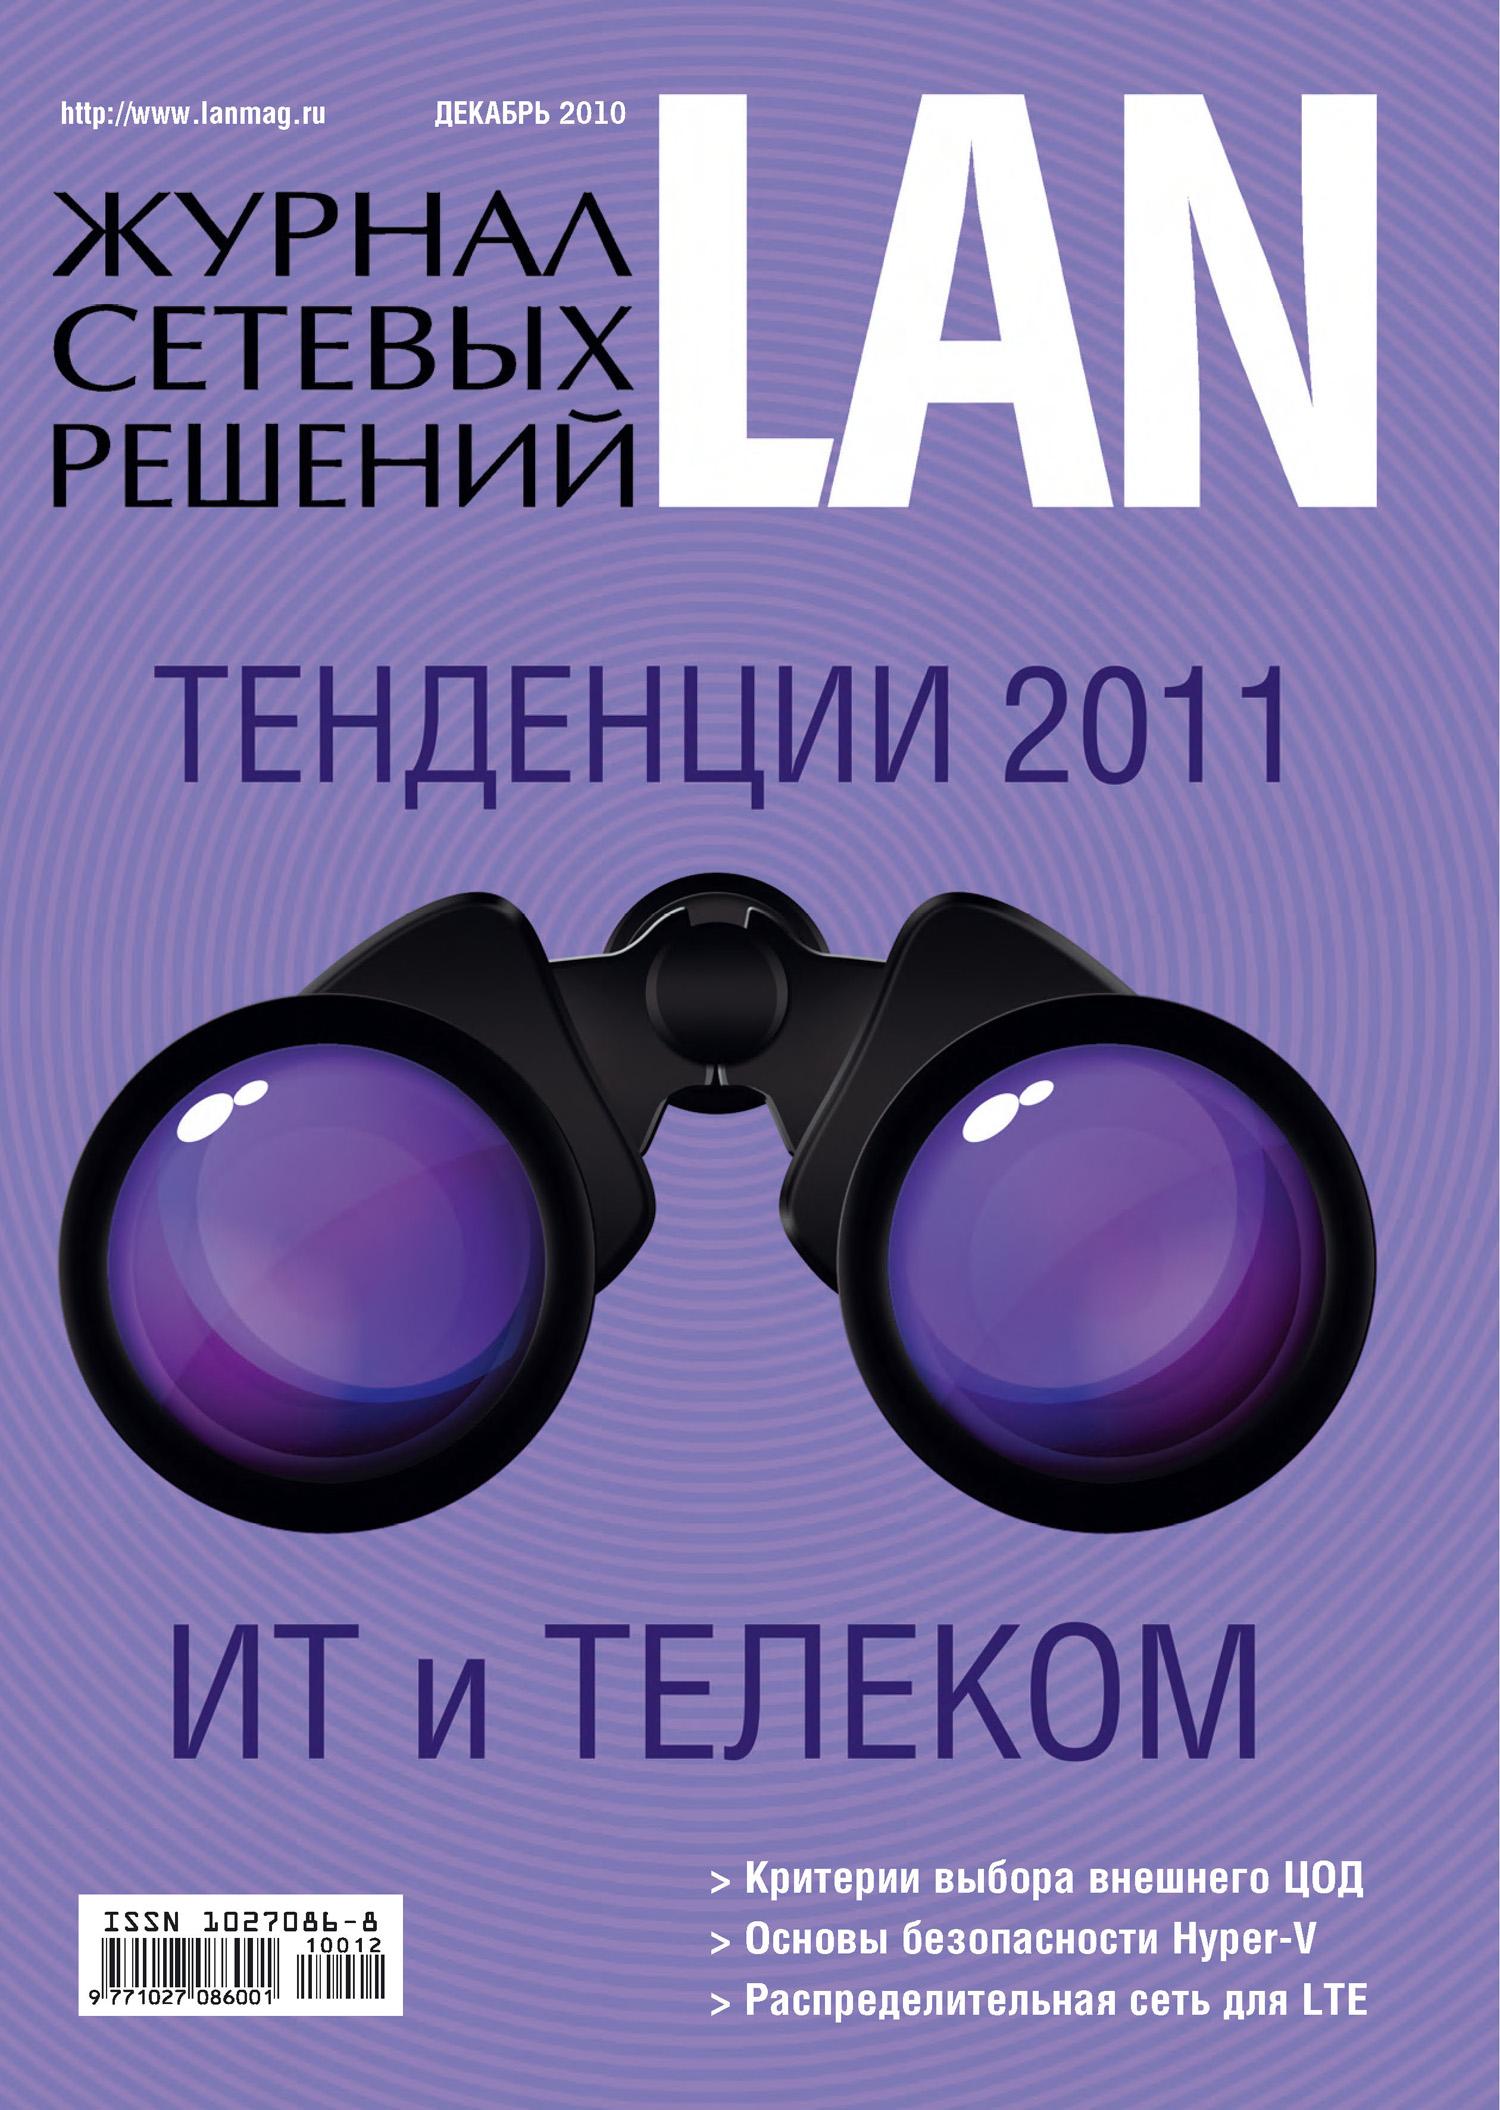 Журнал сетевых решений / LAN №12/2010